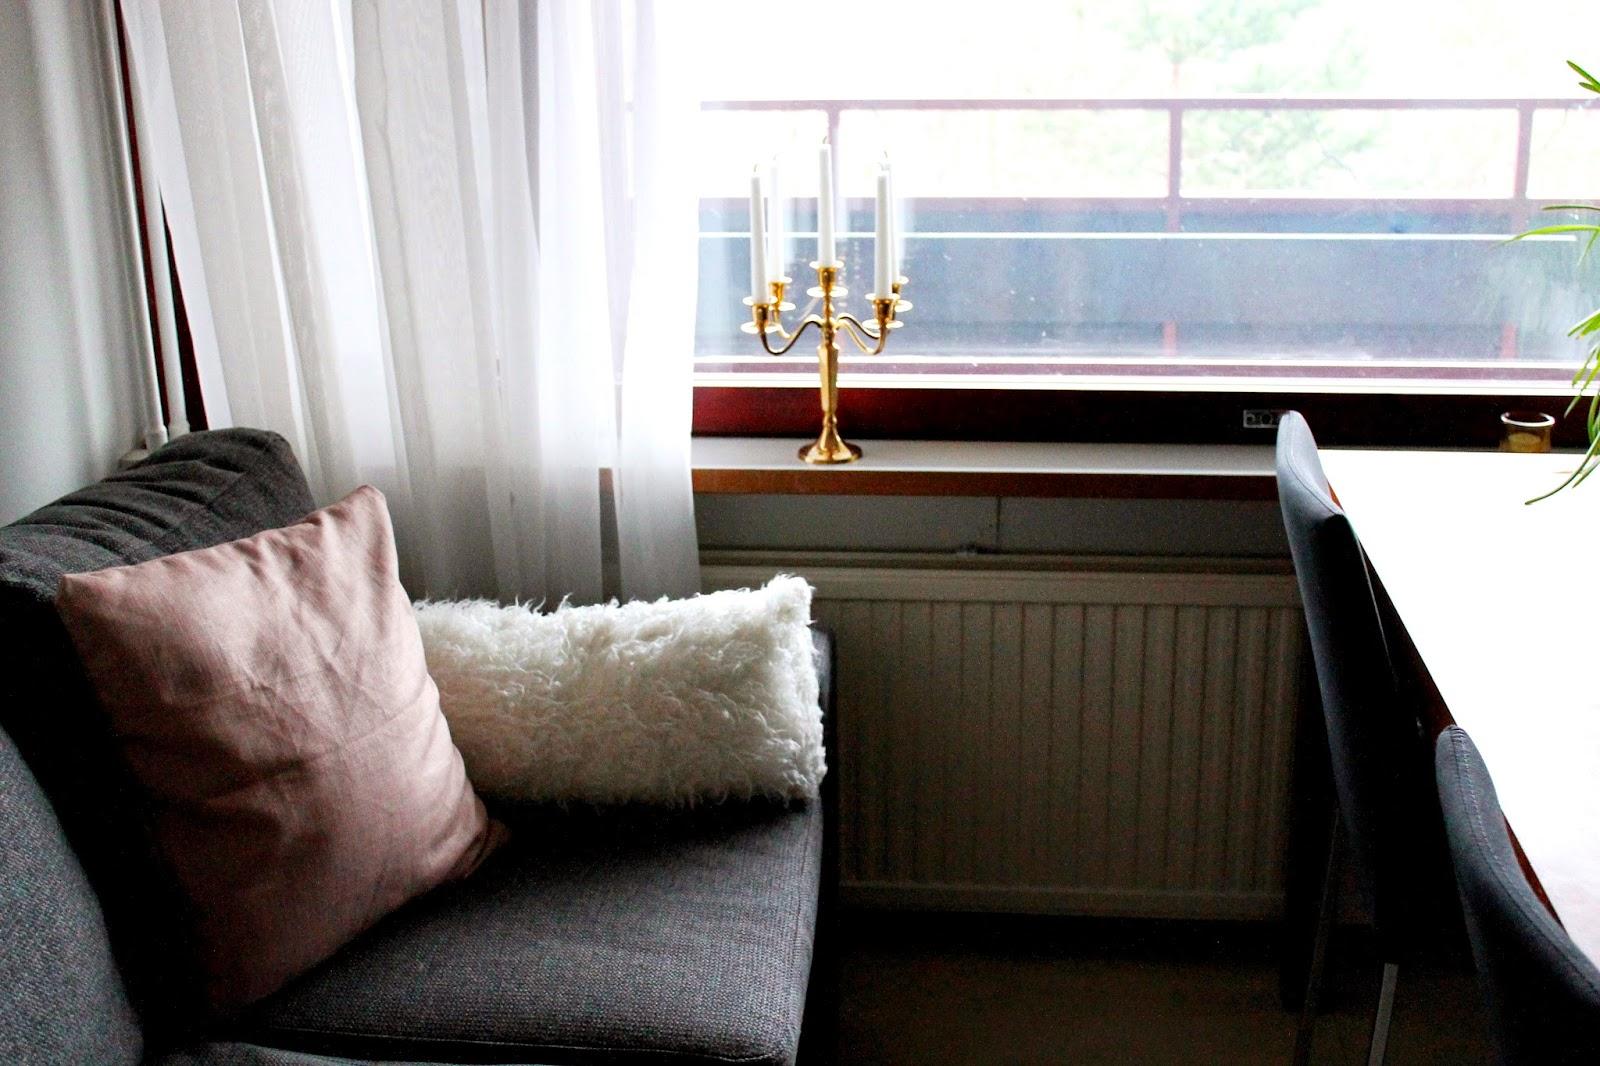 New pillowcase on the couch   Alinan kotona blog #pillowmakeover #pillowcase #home #decor #DIY #couch #candles #gold